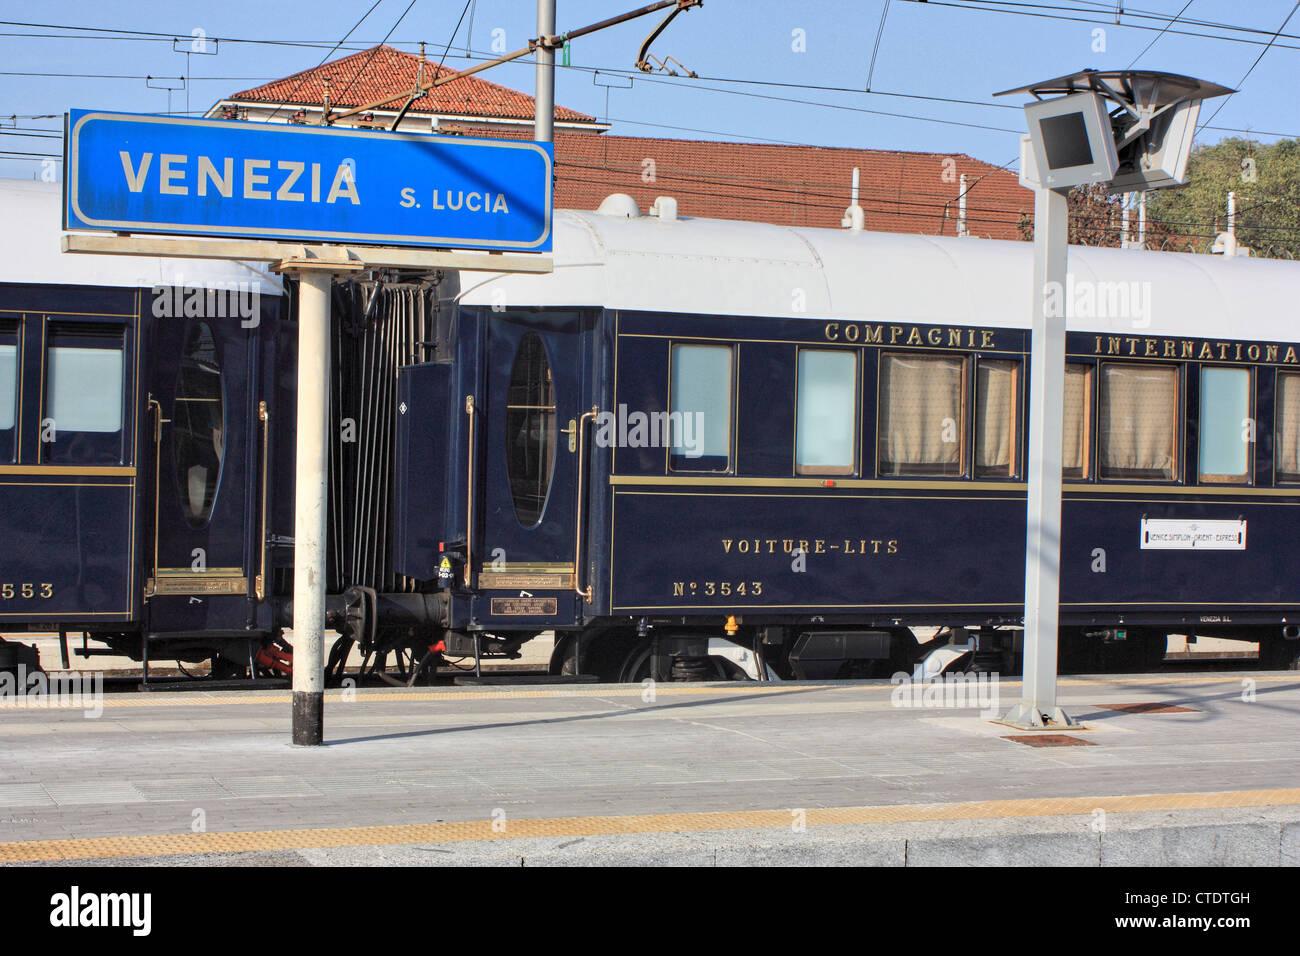 The Venice Simplon Orient Express Luxury Train At Venice